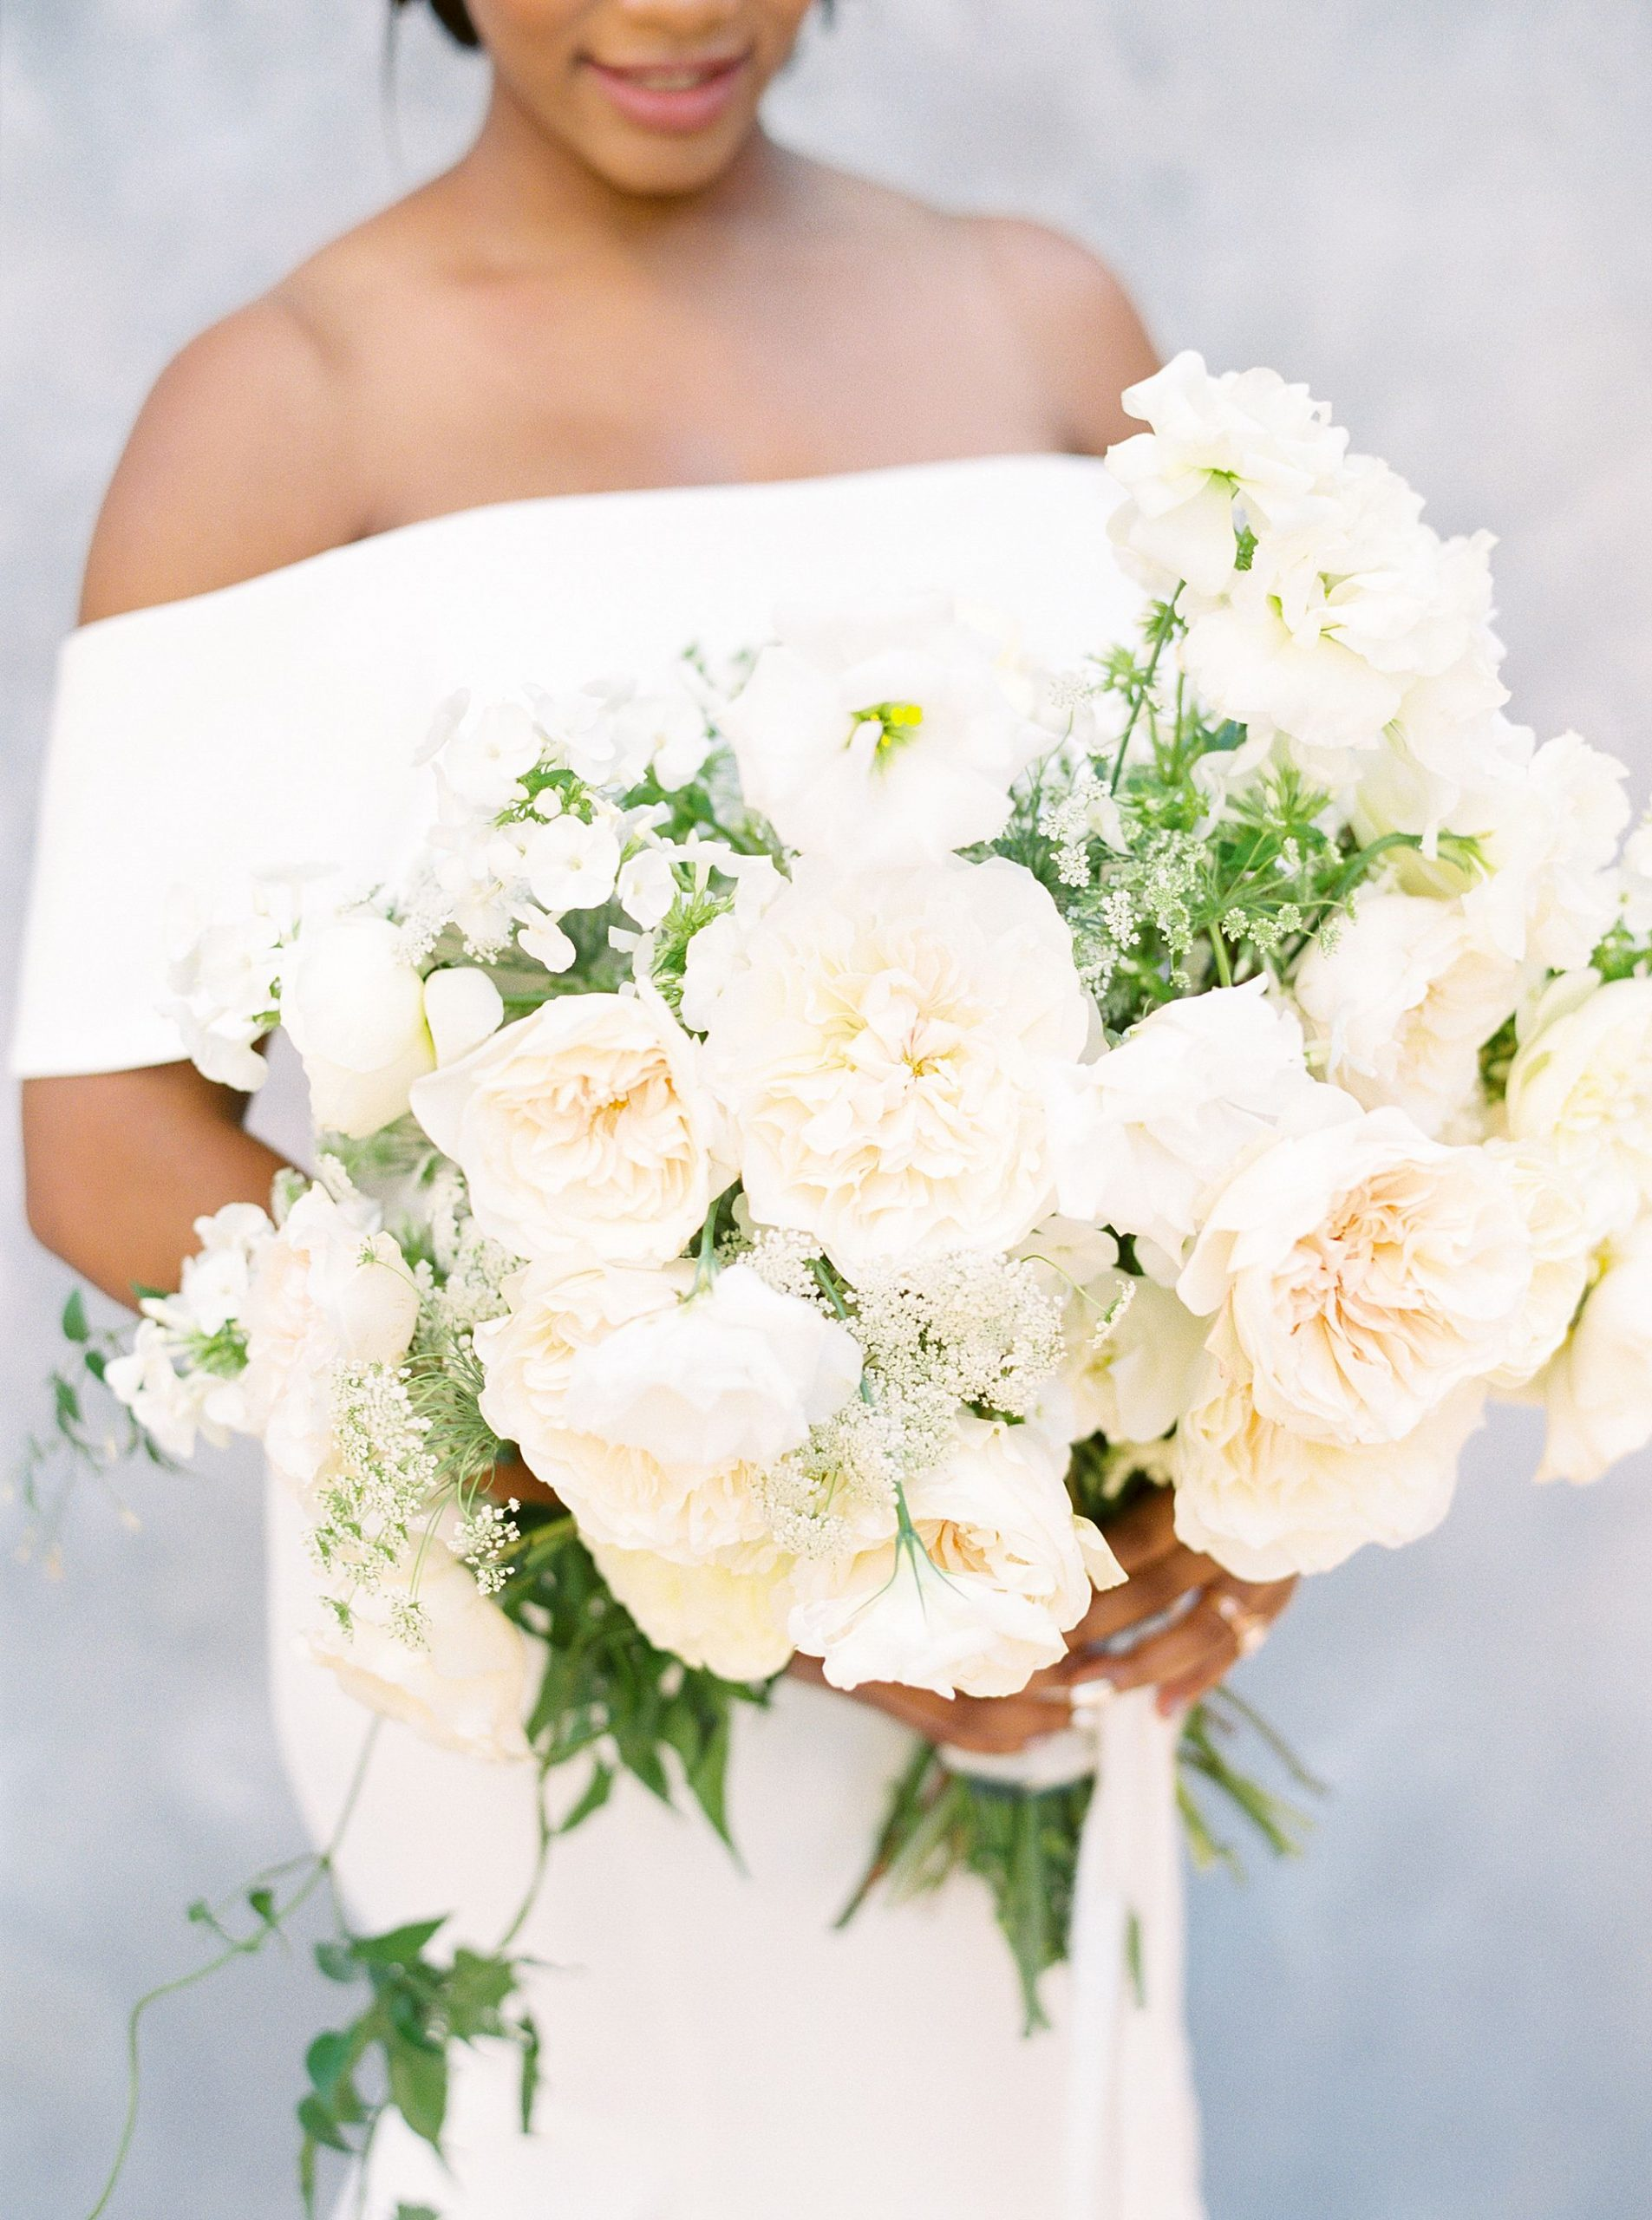 Park Winters Micro-Wedding Inspiration on Style Me Pretty - Stephanie Teague Events - Ashley Baumgartner - Park Winters Wedding - Black Tie Wedding - Micro-Wedding Sacramento Photographer_0026.jpg